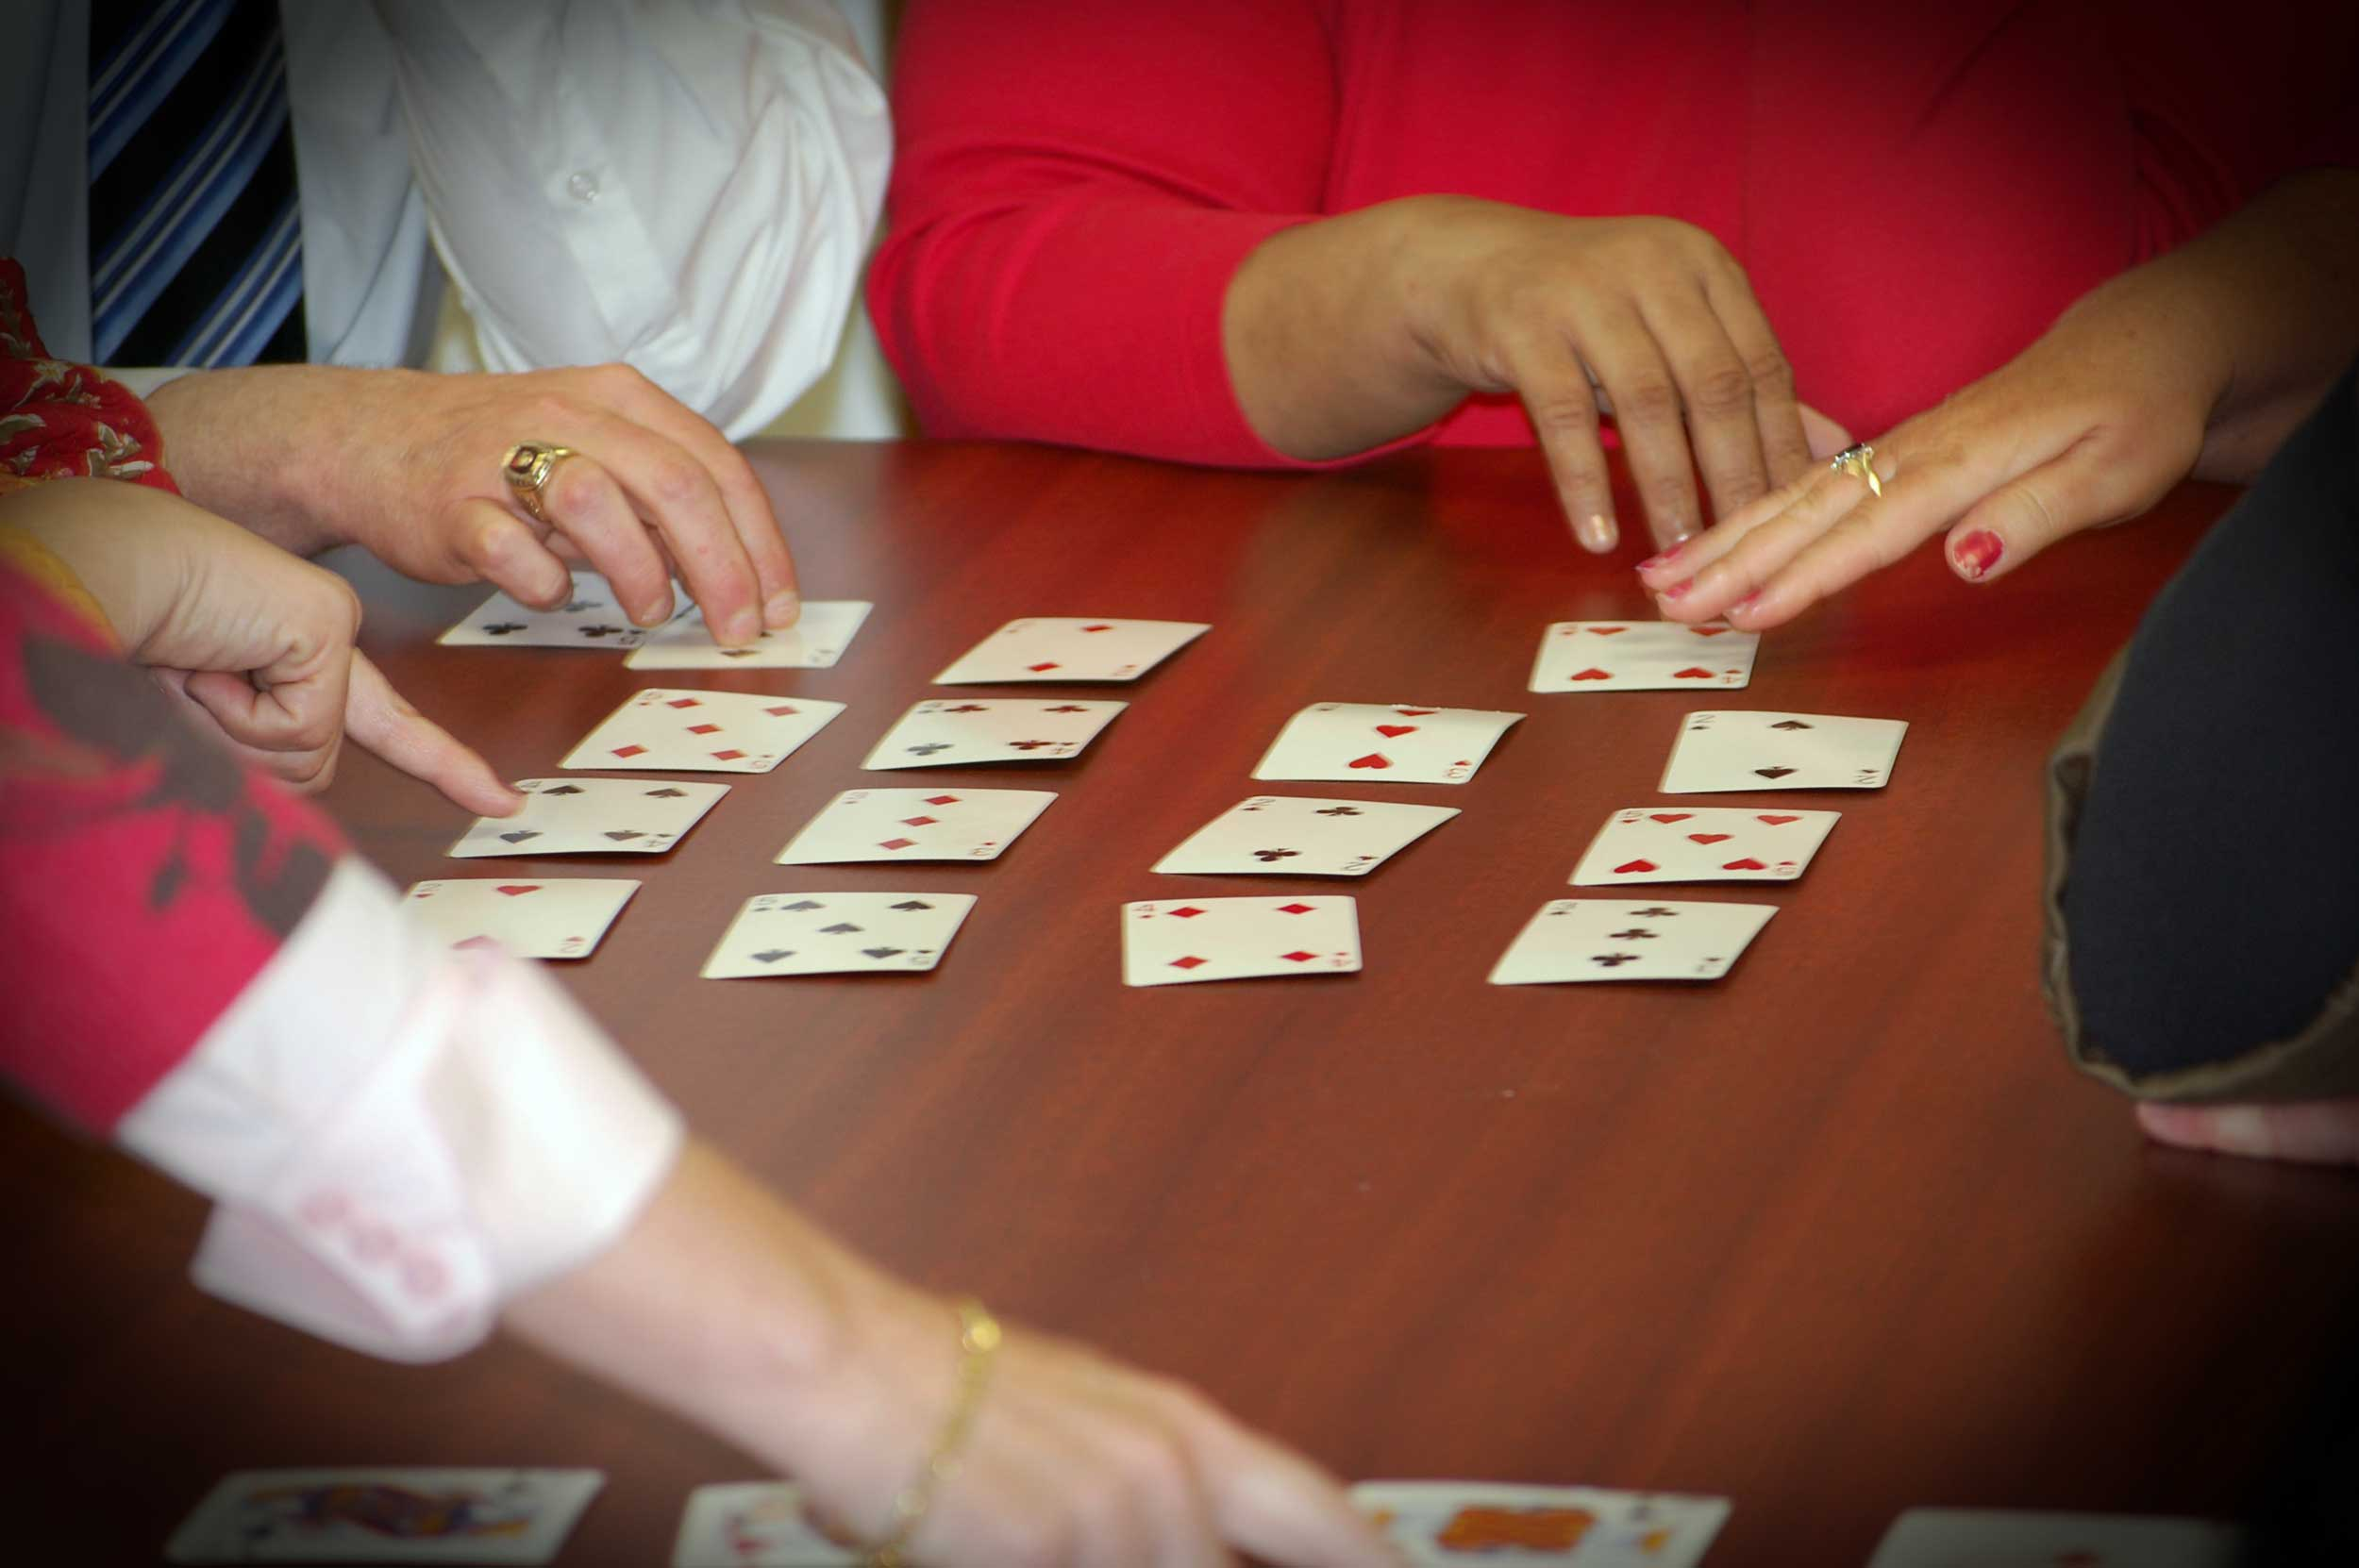 aaa-Team-Cards-1.jpg